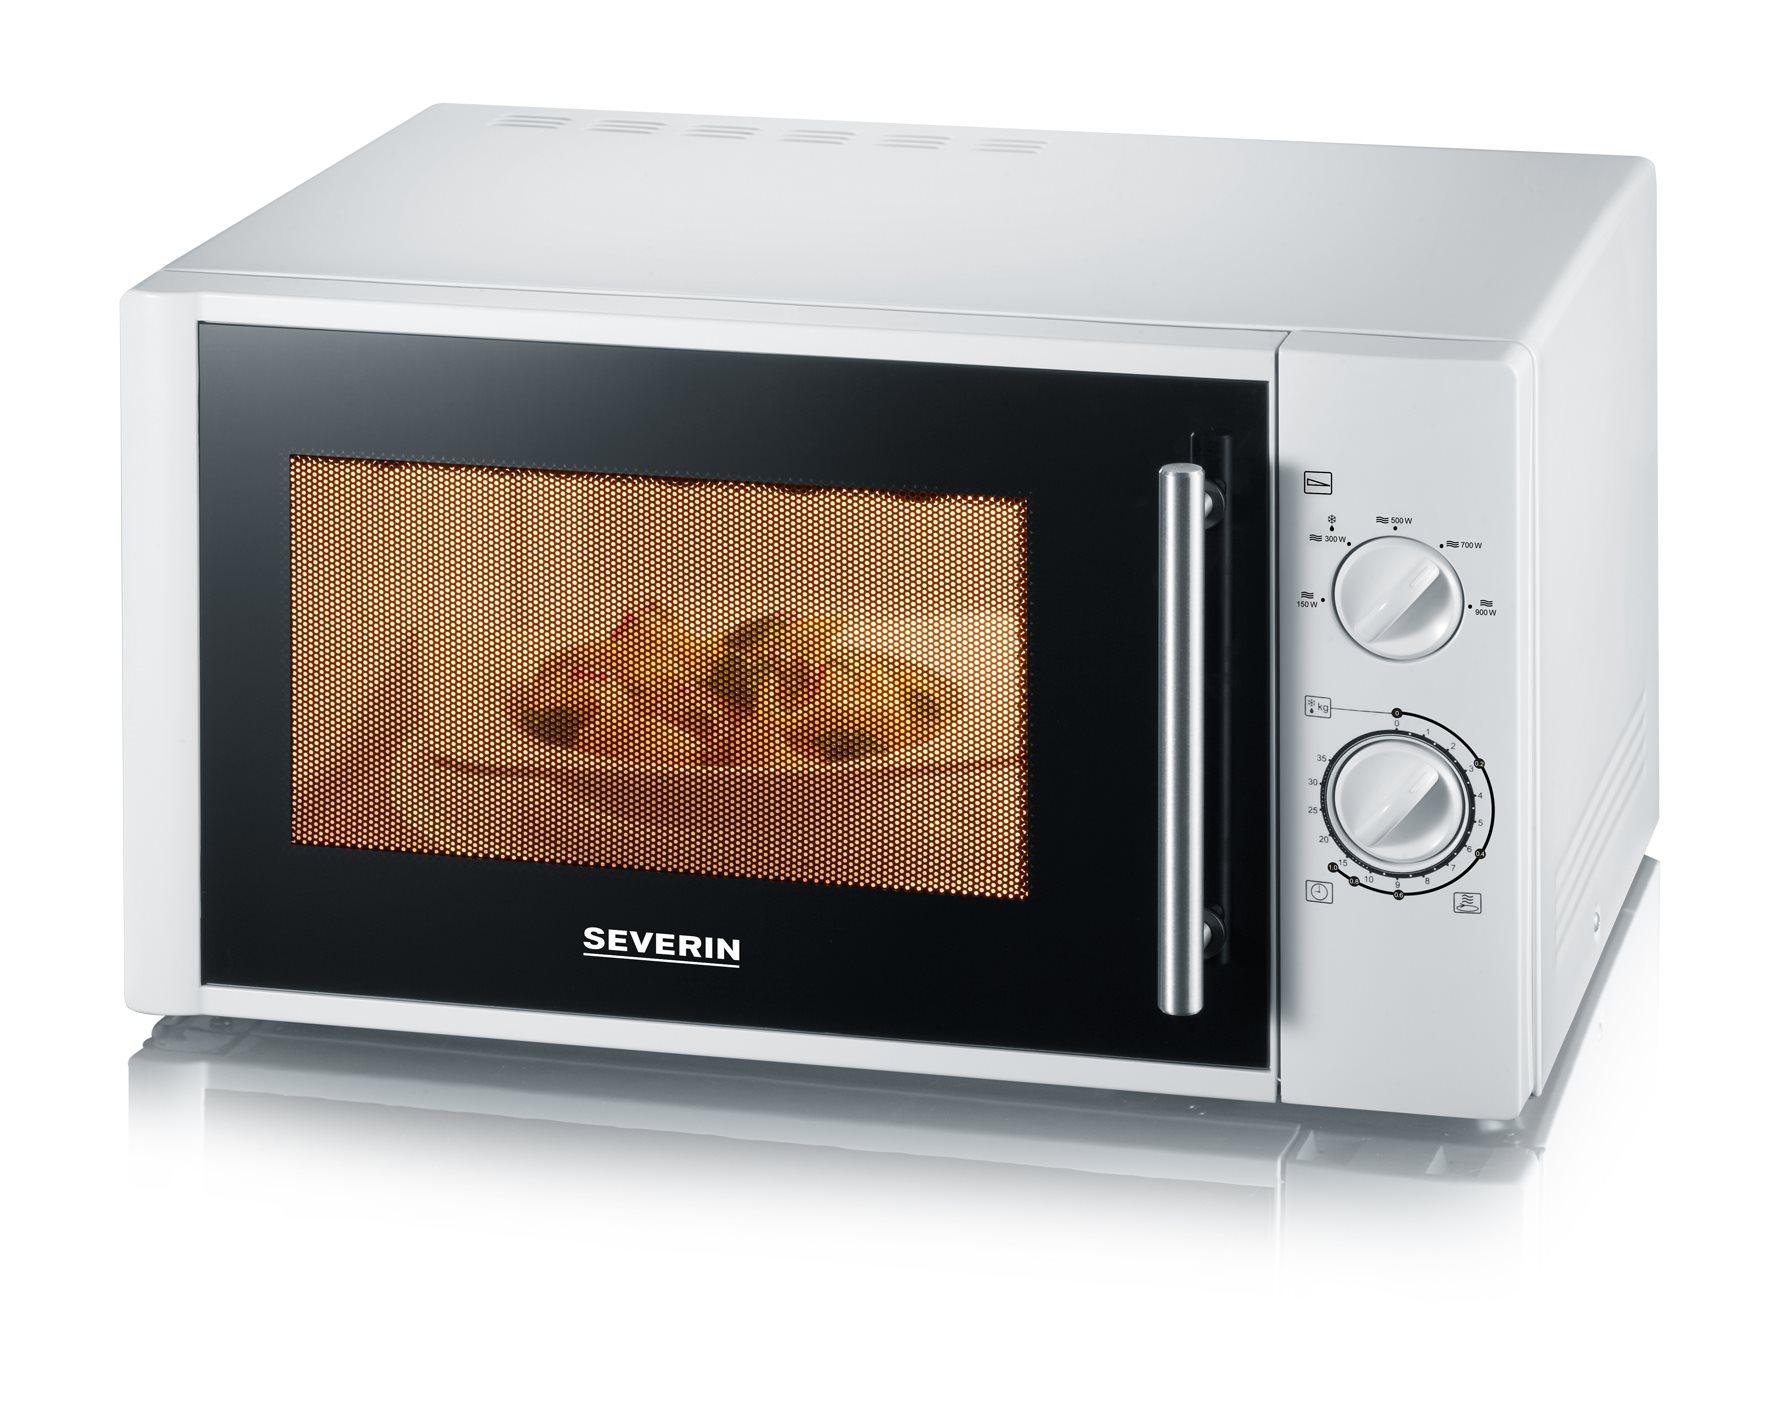 SEVERIN Φούρνος Μικροκυμάτων 28LT 900W Λευκός - 7873